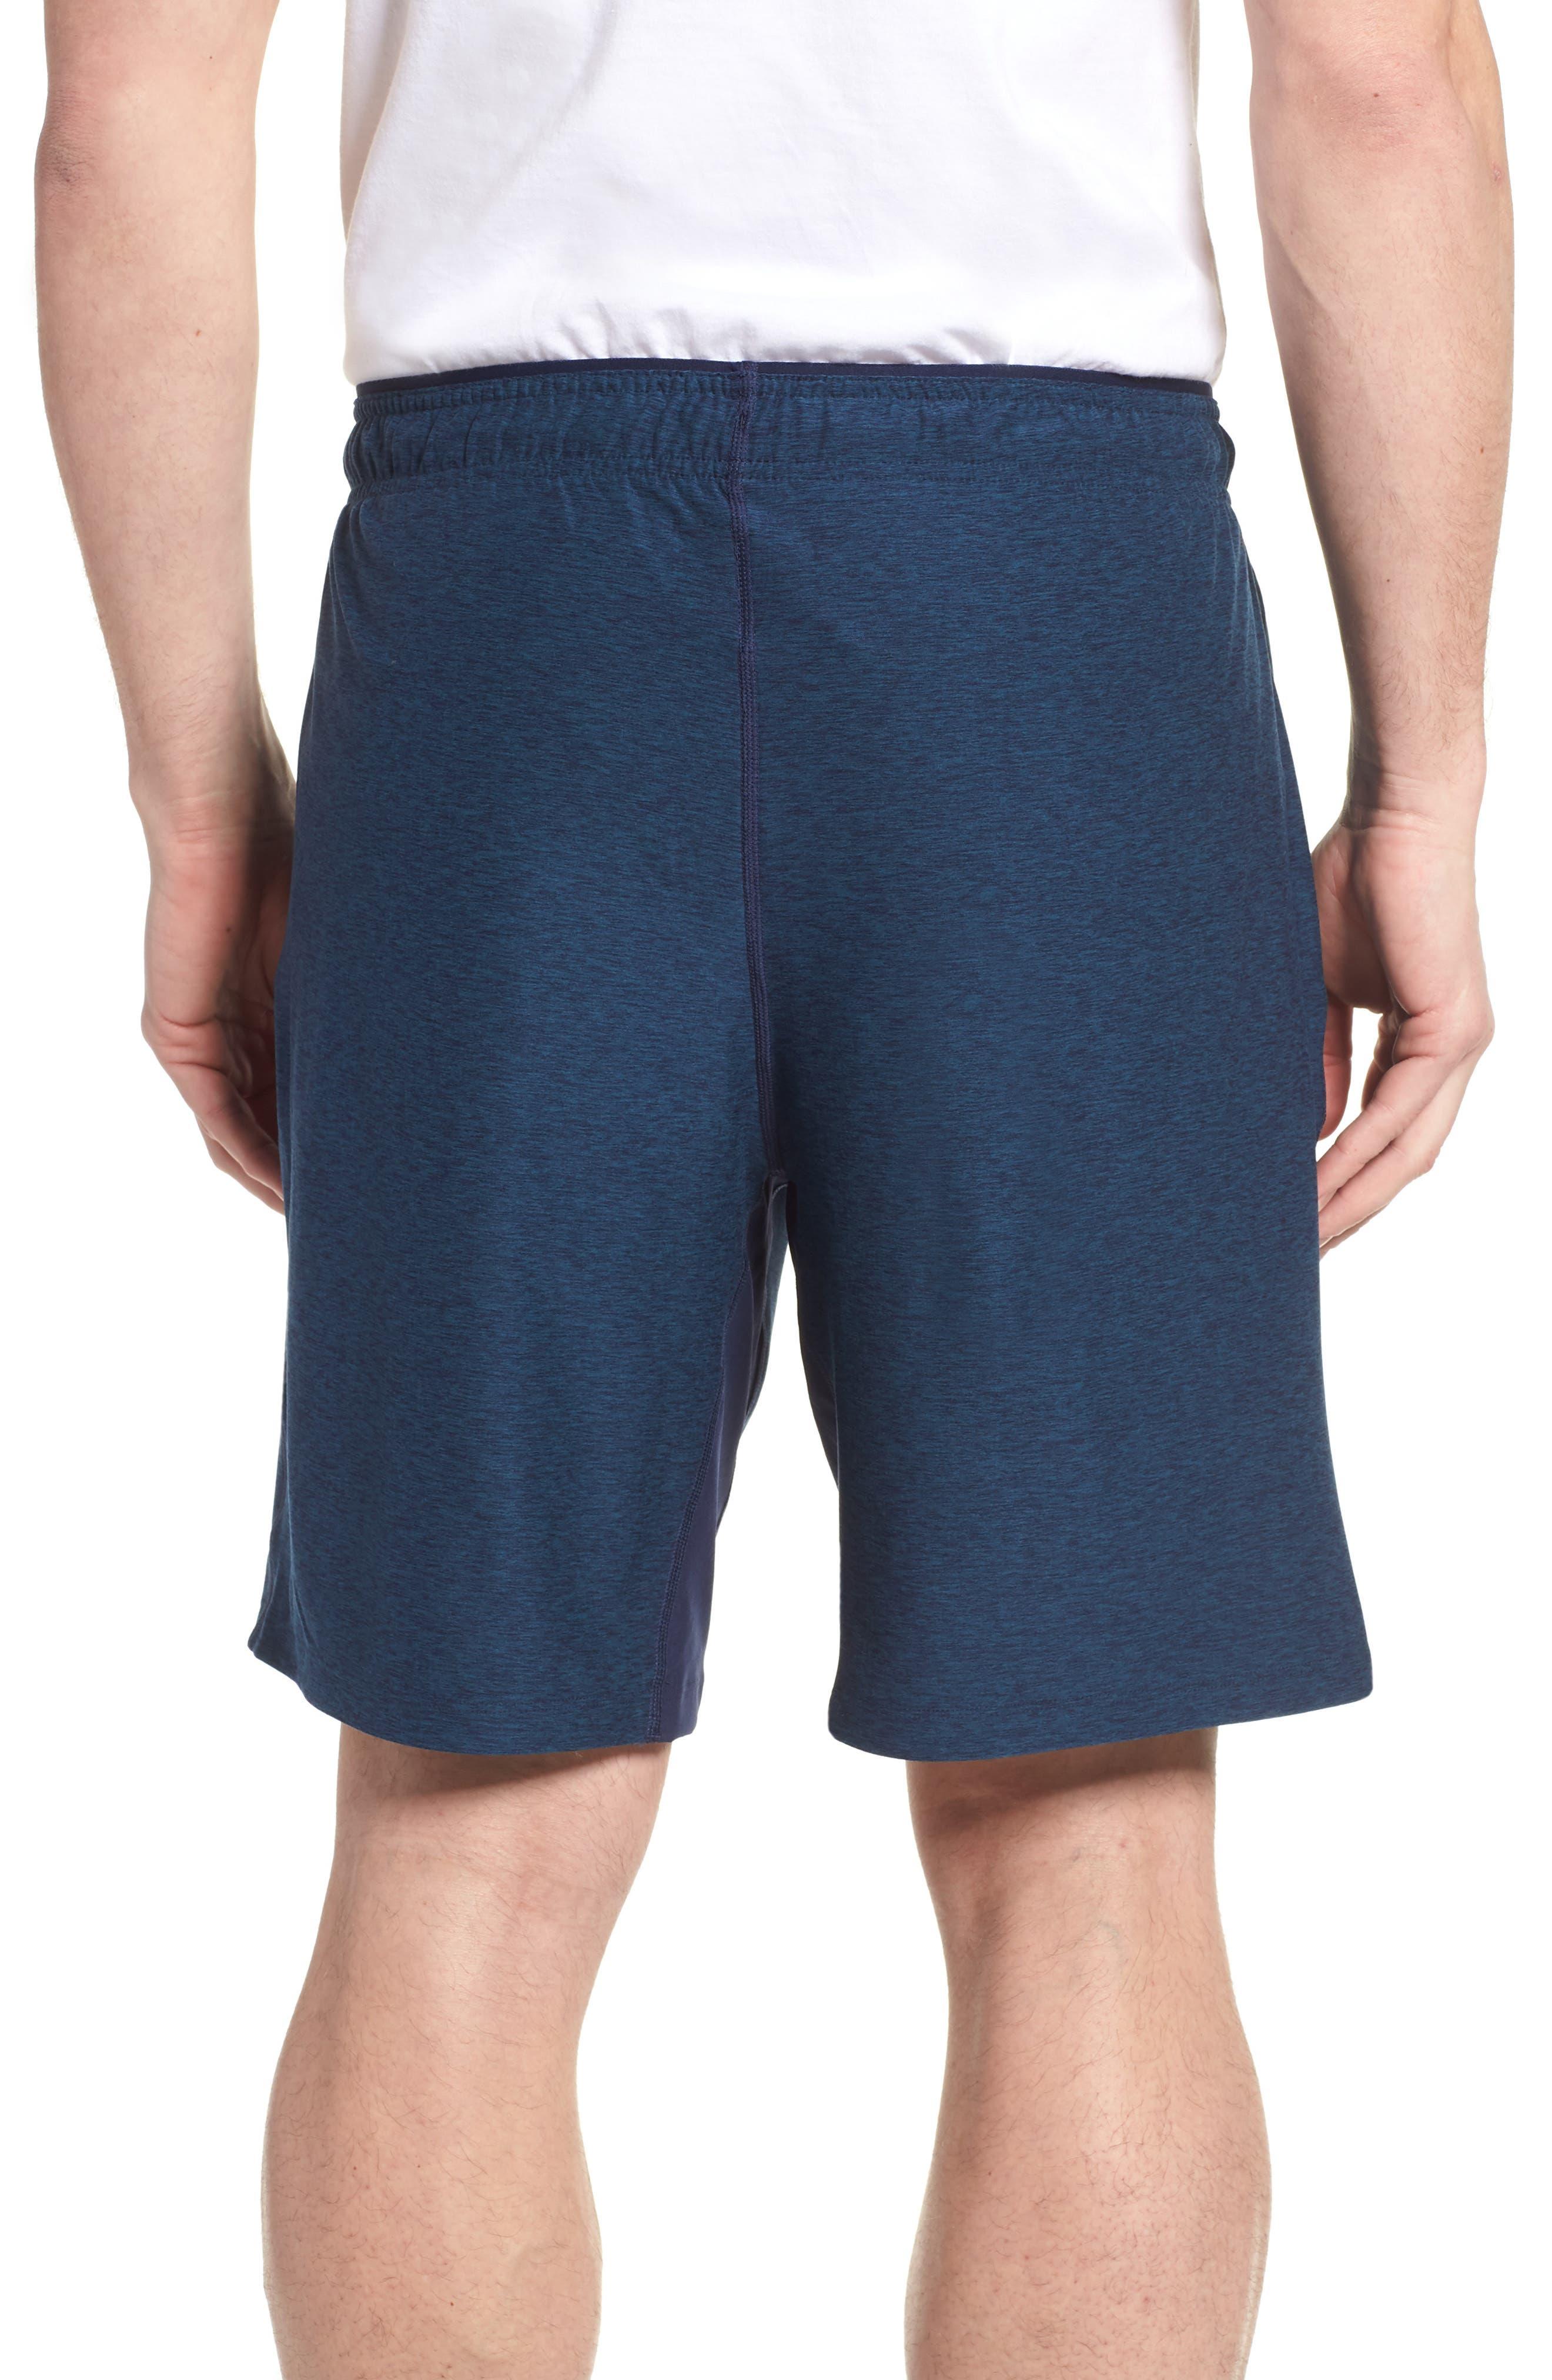 Anticipate Shorts,                             Alternate thumbnail 2, color,                             Pigment